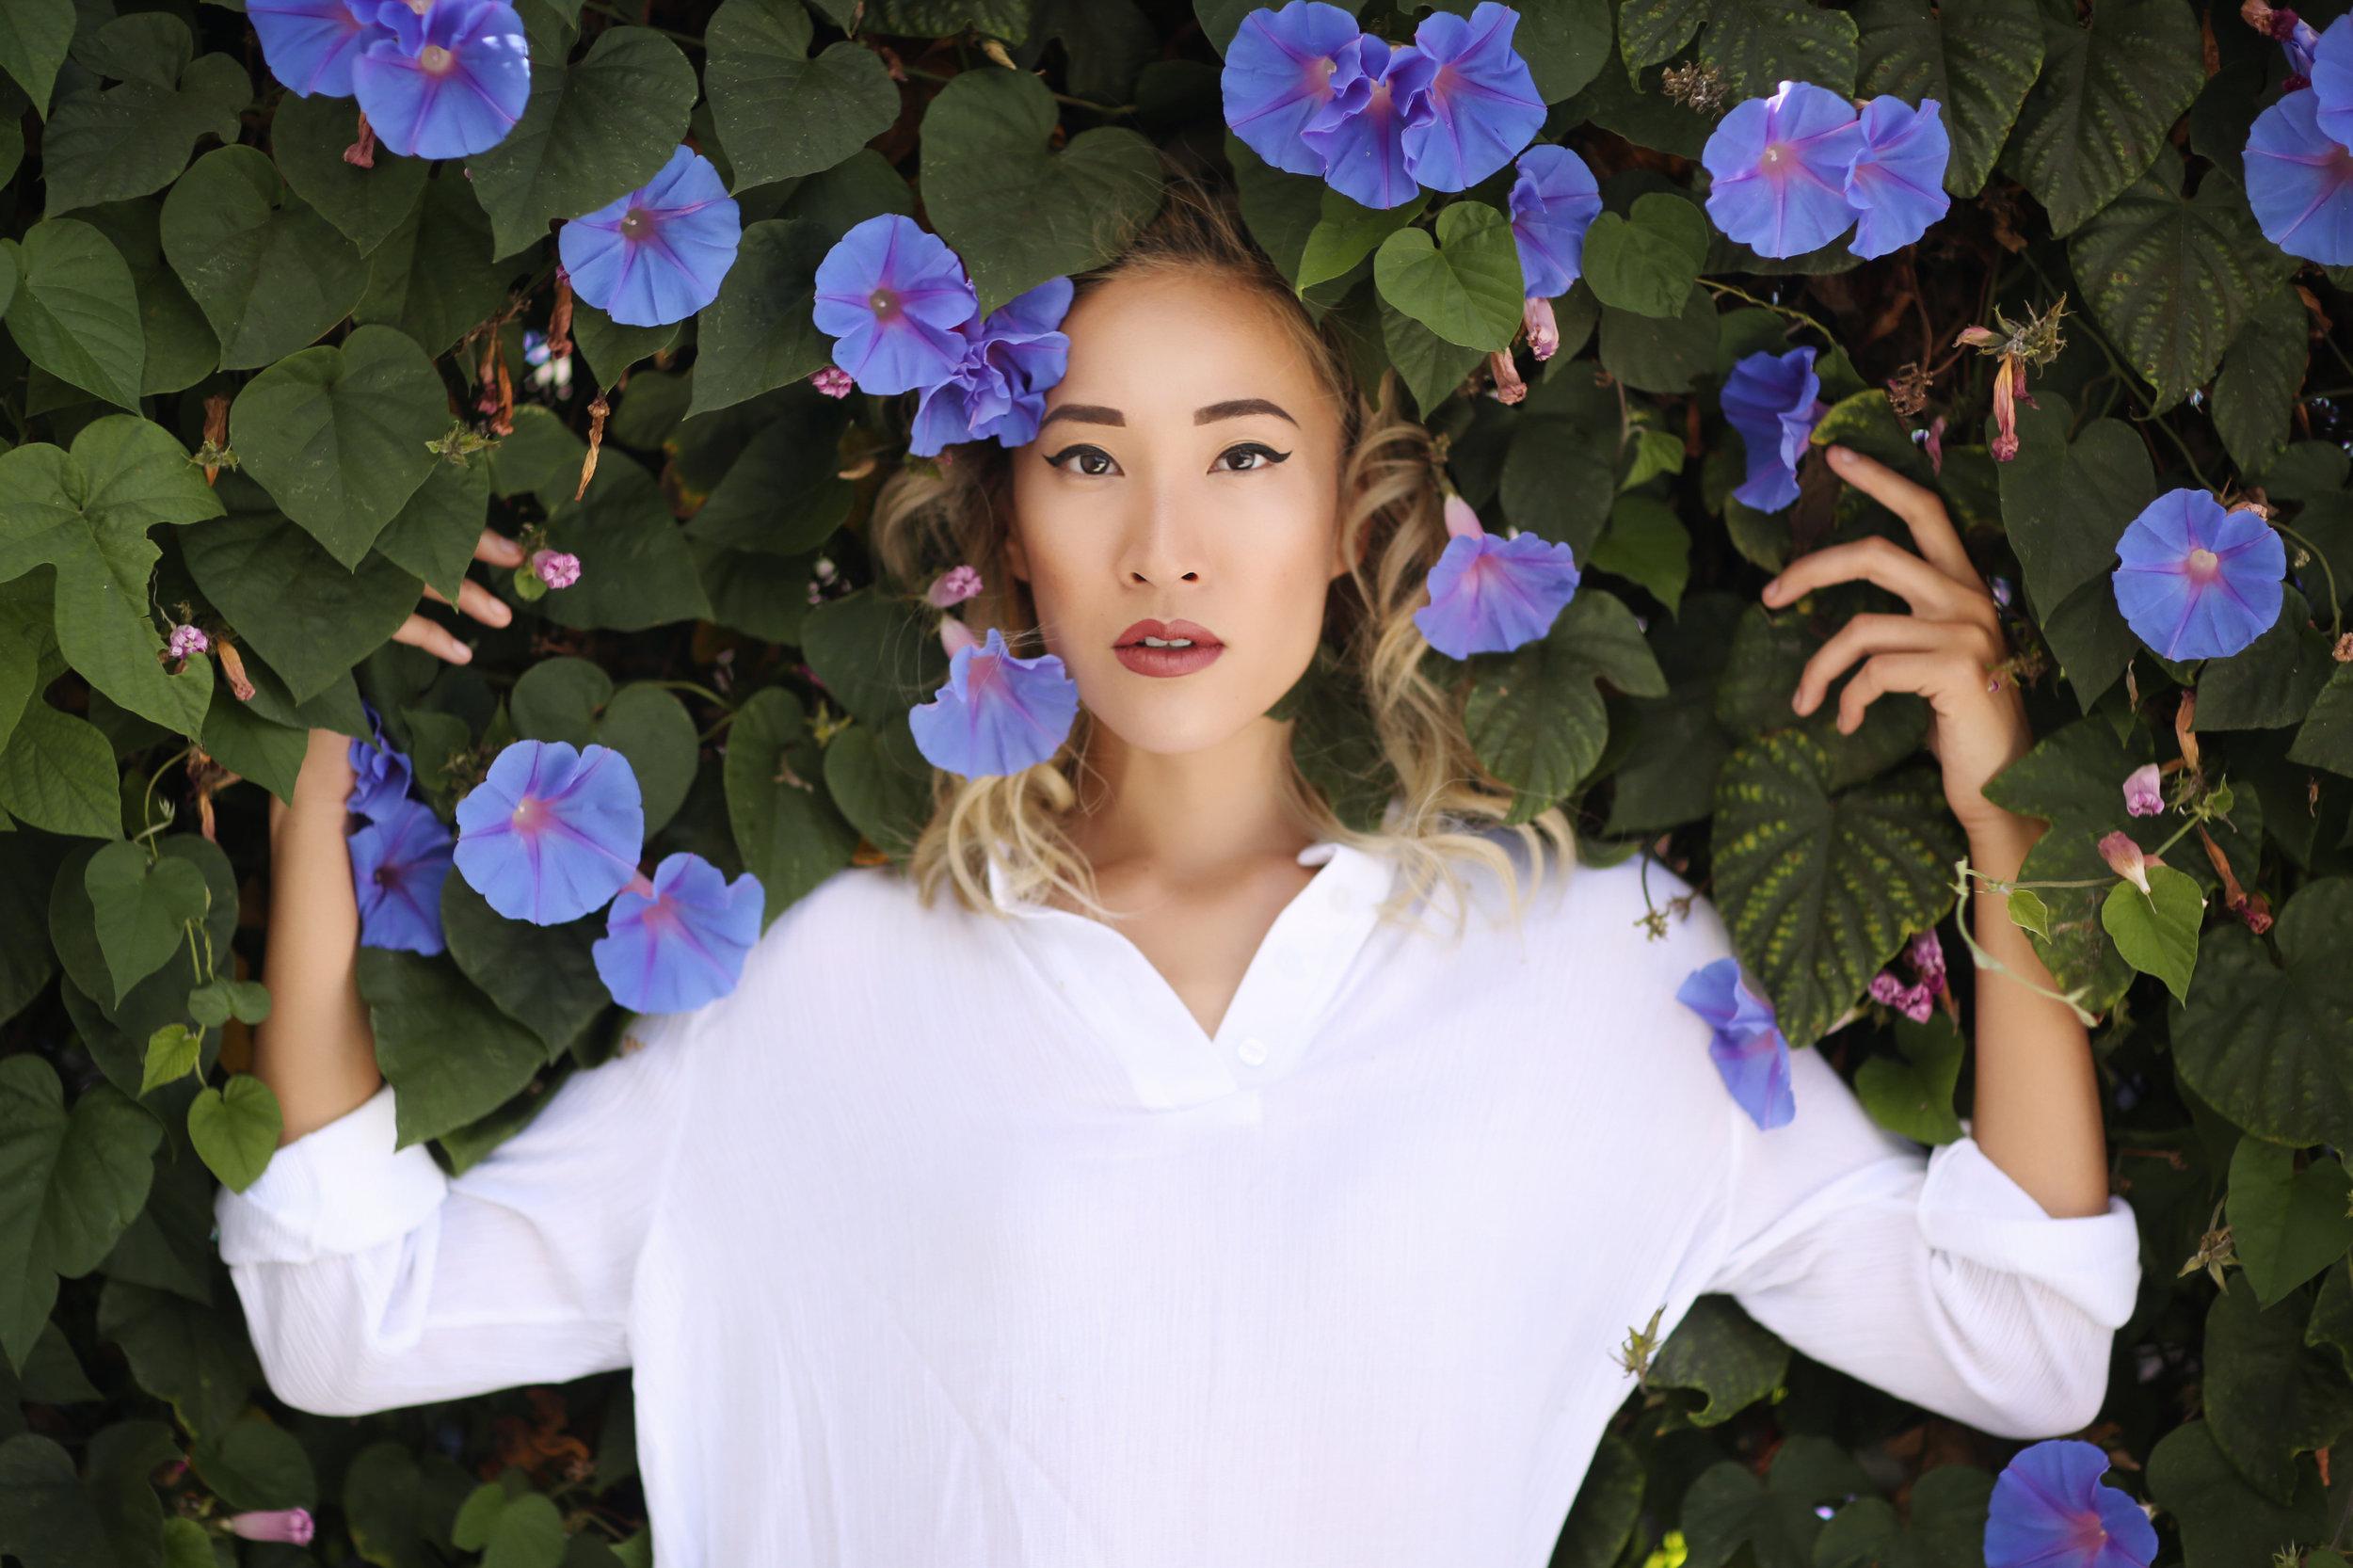 Feast Fashion Faves Amanda Nguyen portrait in the morning glory flowers